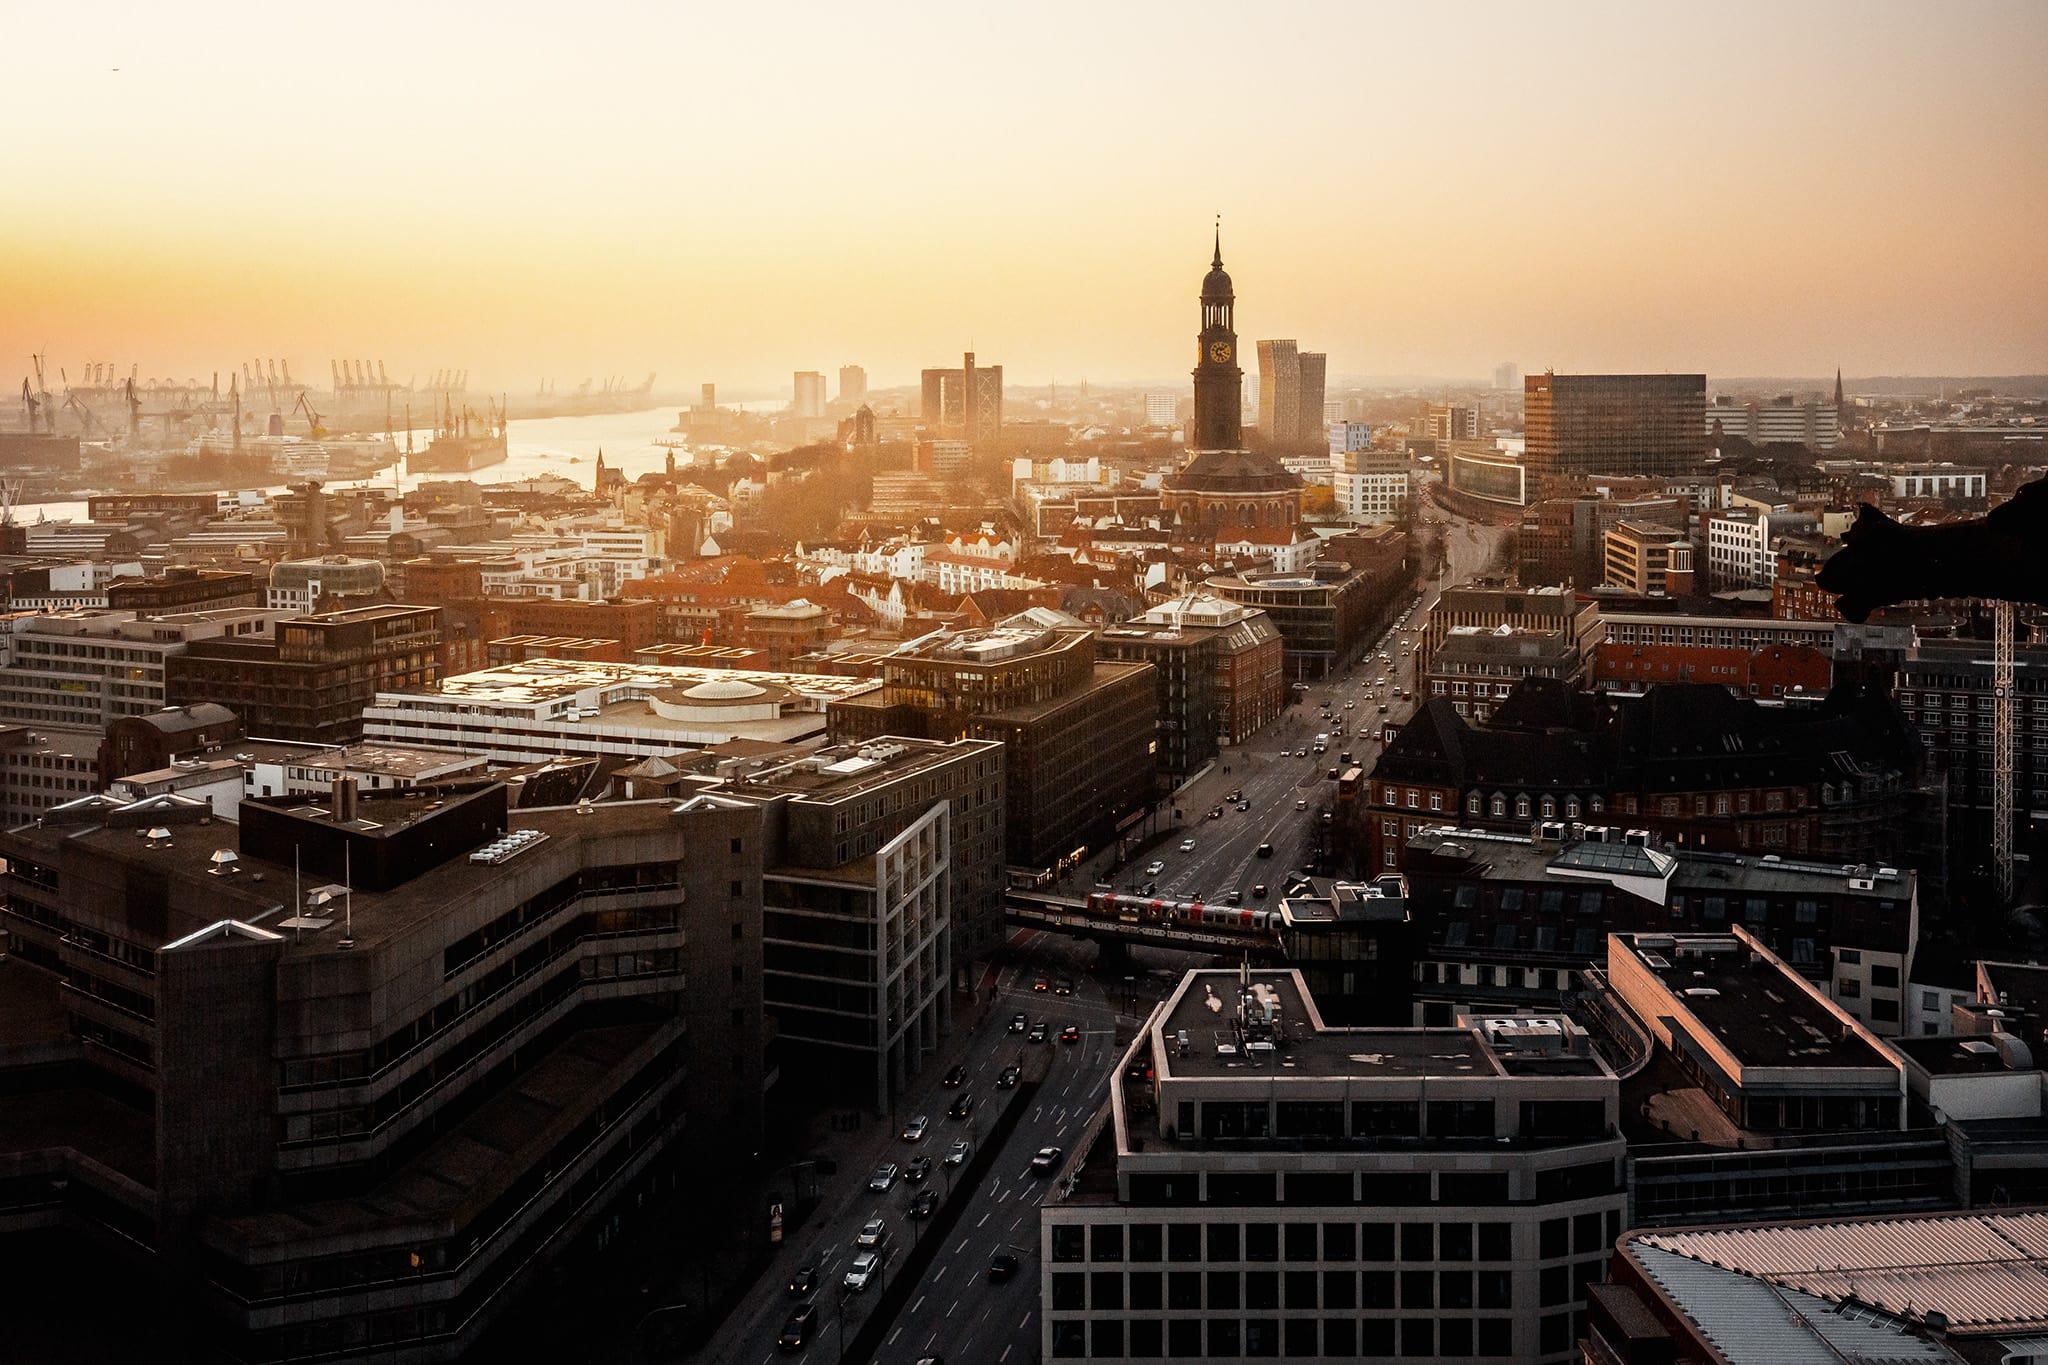 HafenCity Hamburg mit Elbphilharmonie und Mahnmal St. Nikolai